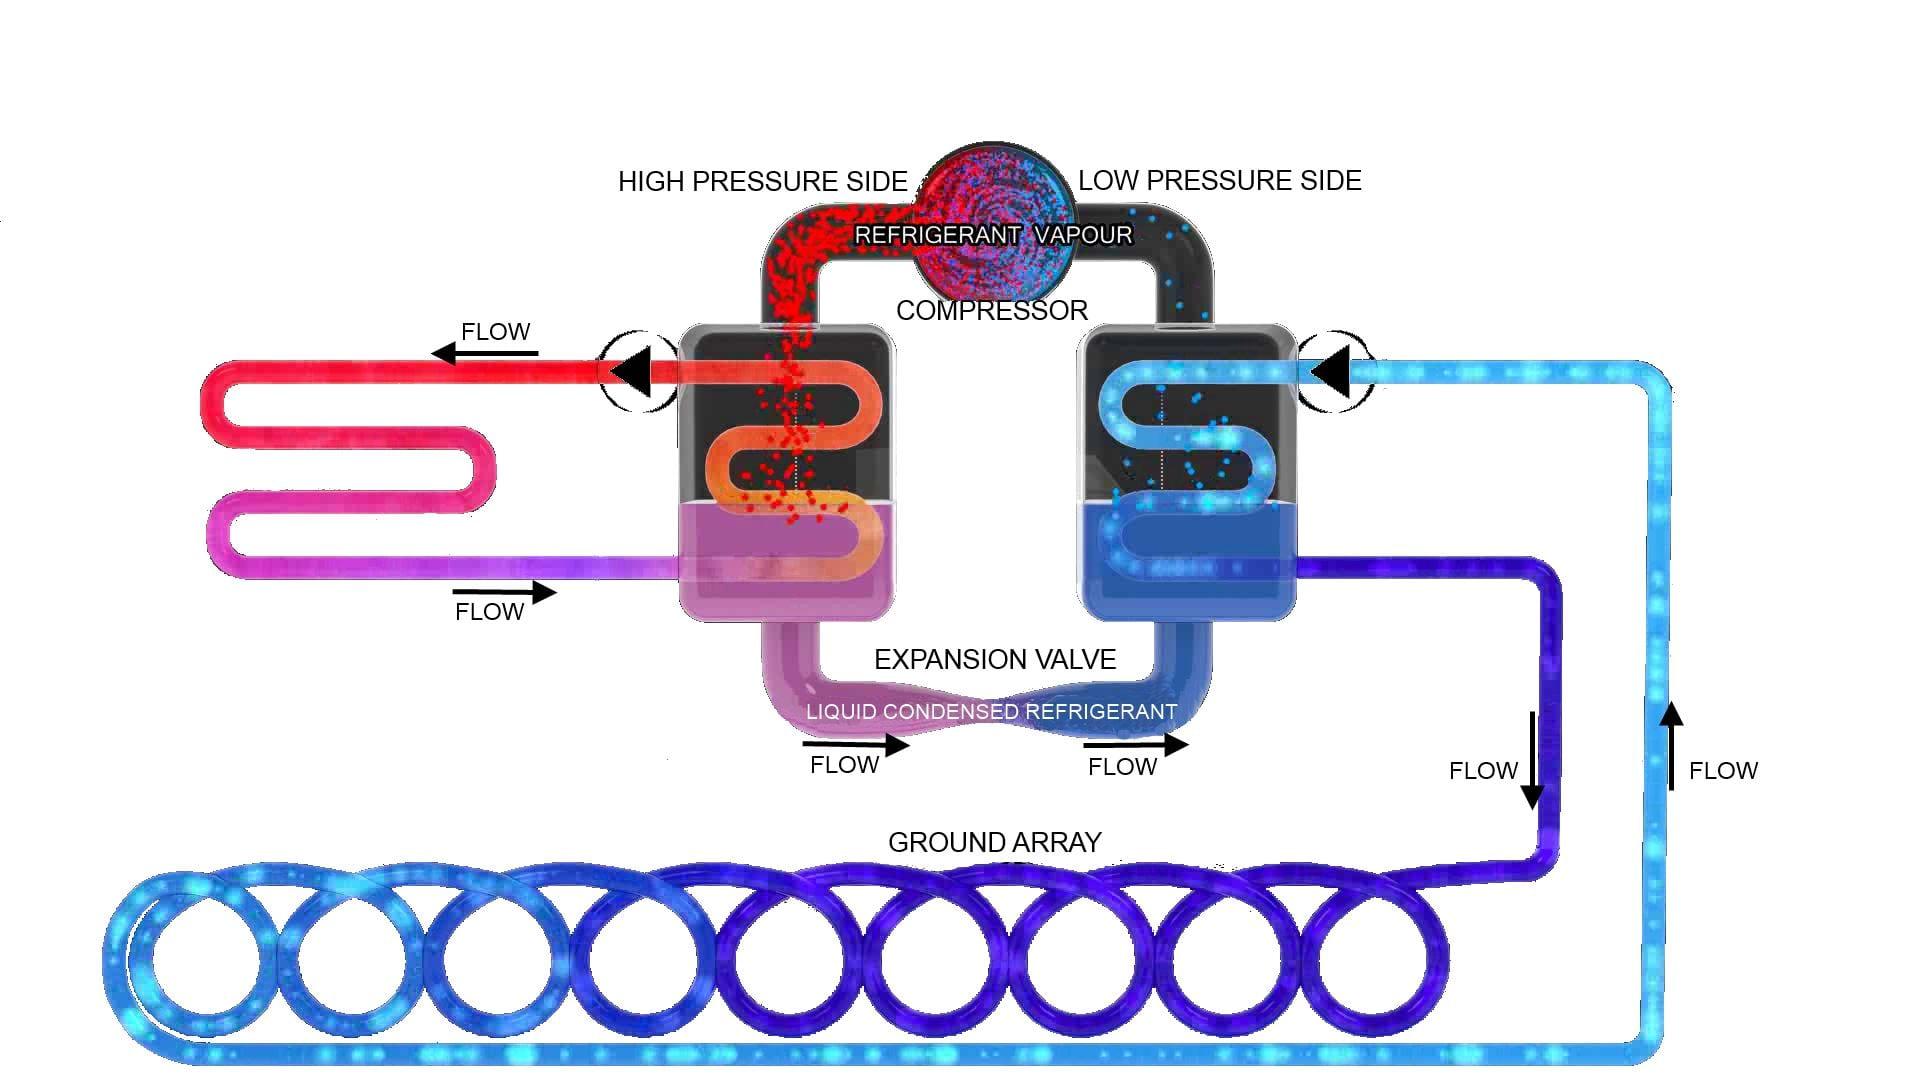 hight resolution of improving heat pump efficiency